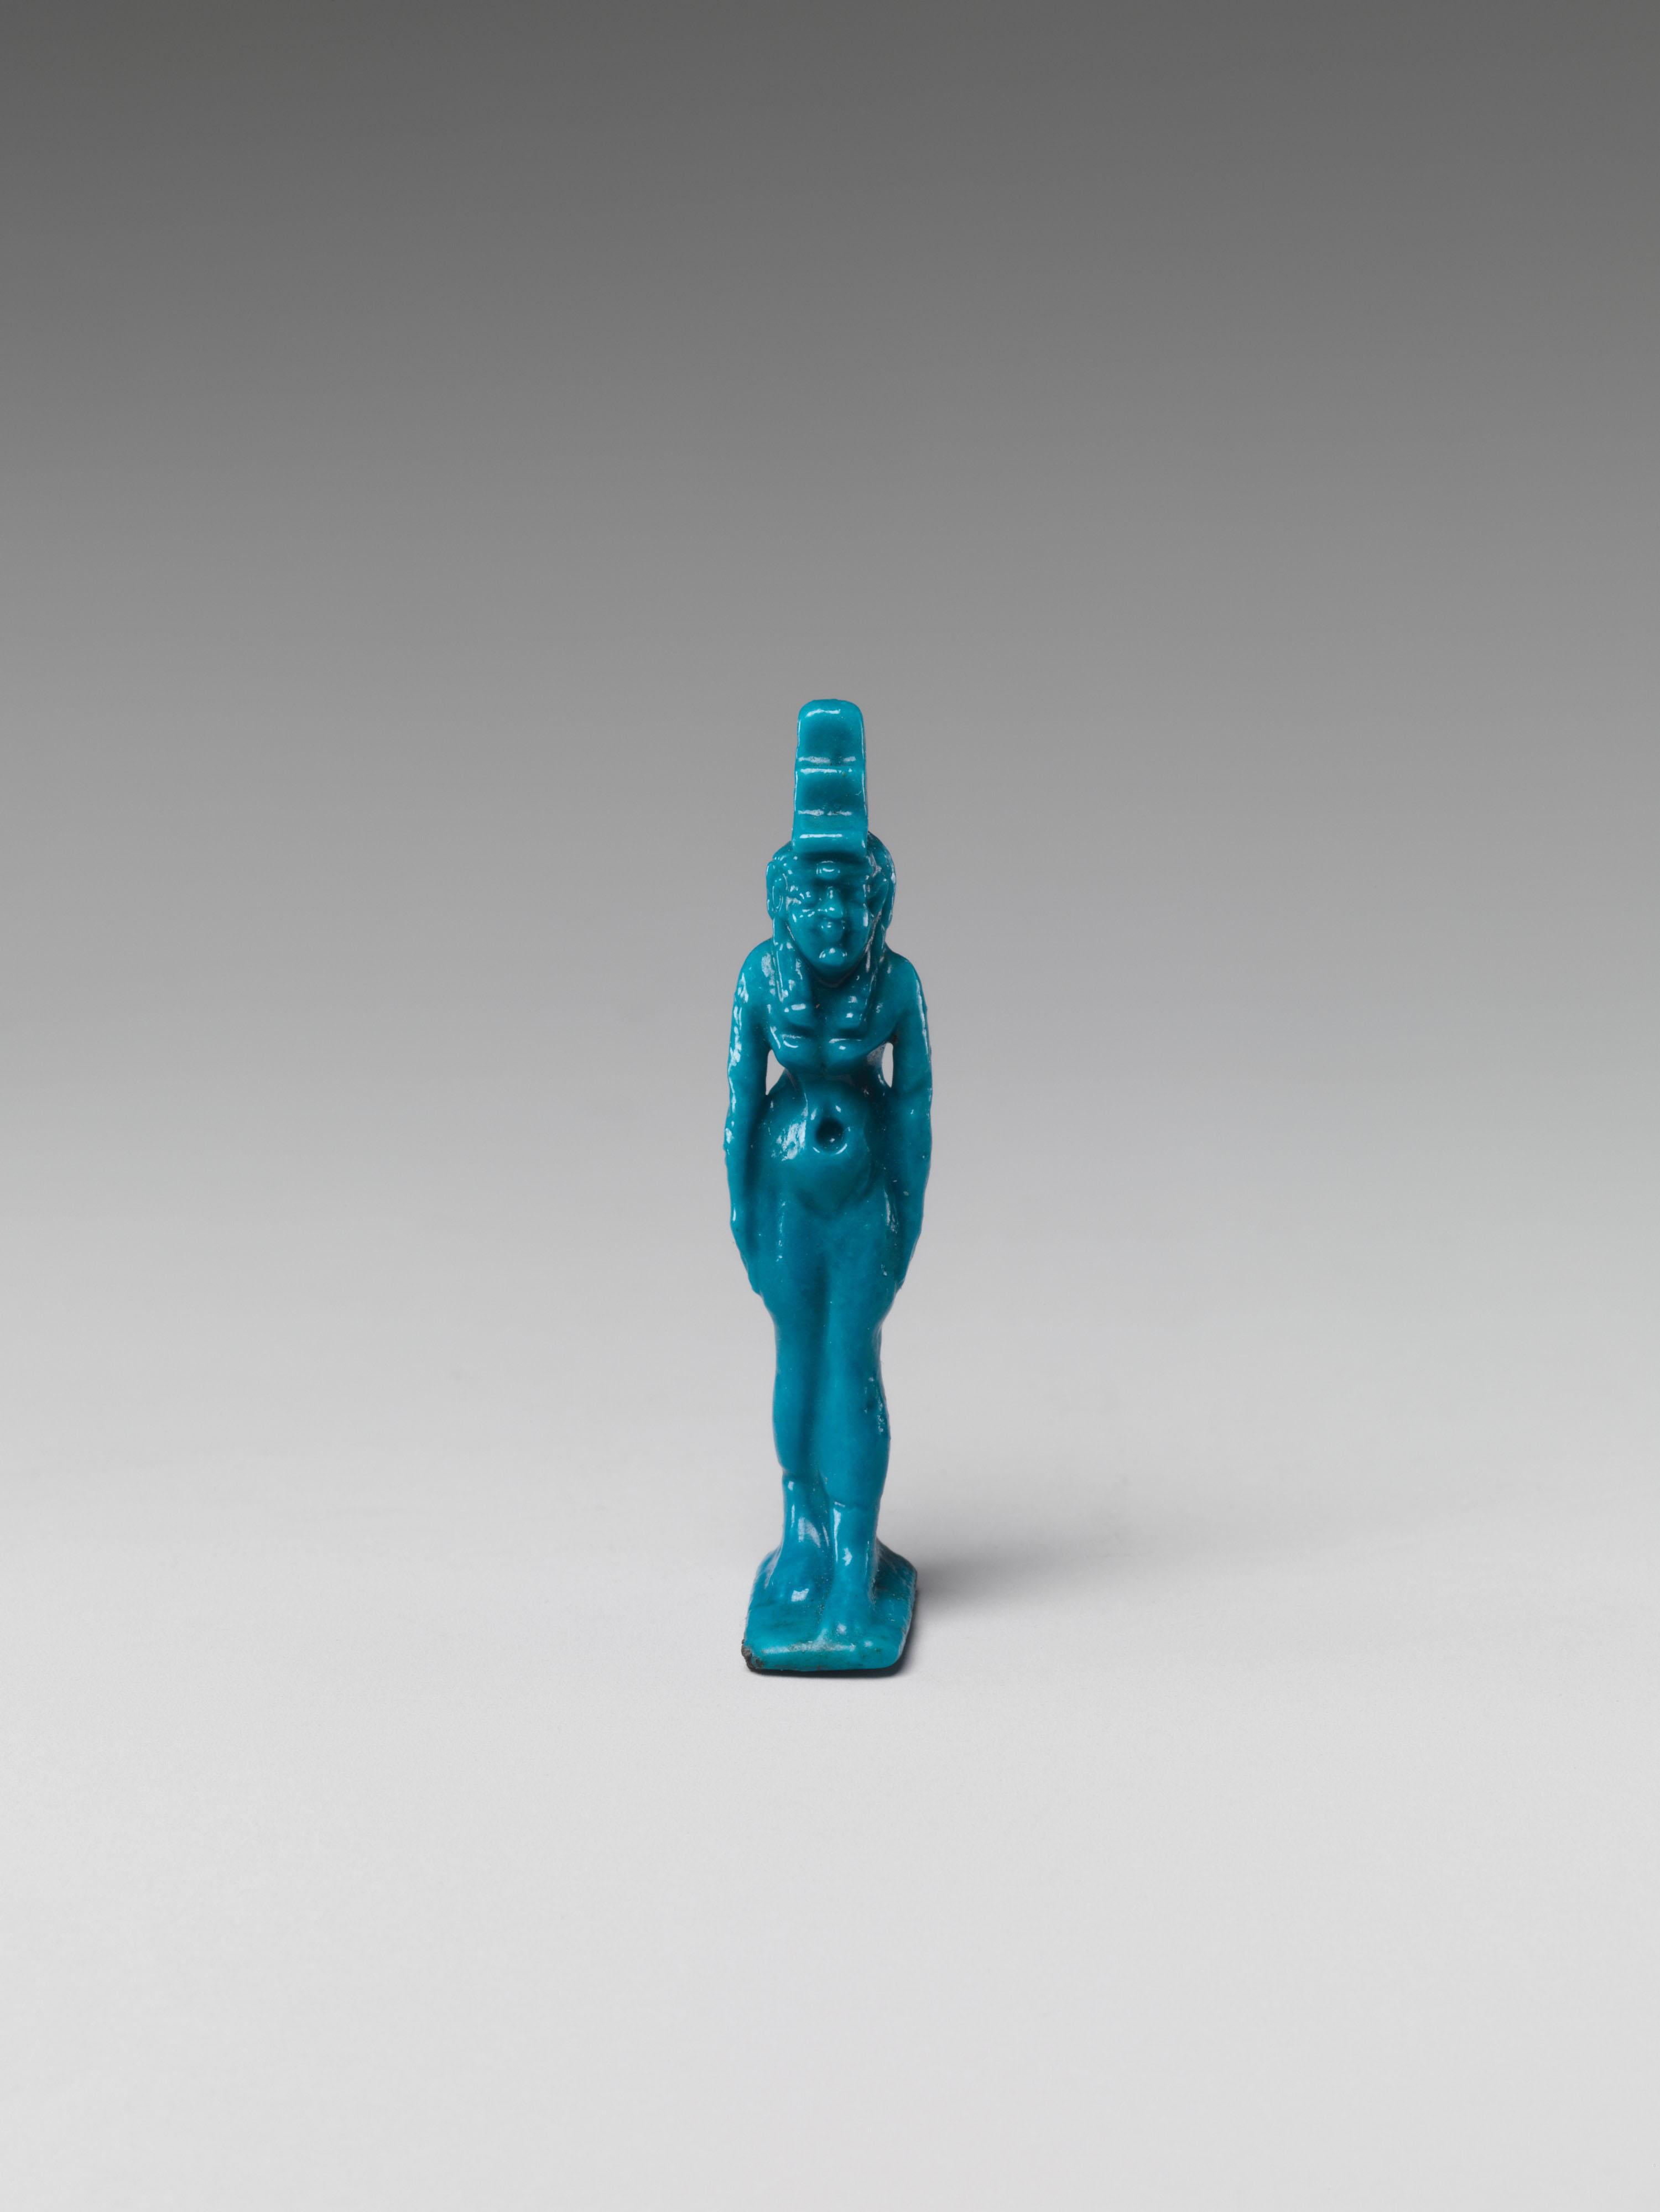 Ancient Egyptian Amulets | Essay | Heilbrunn Timeline of Art